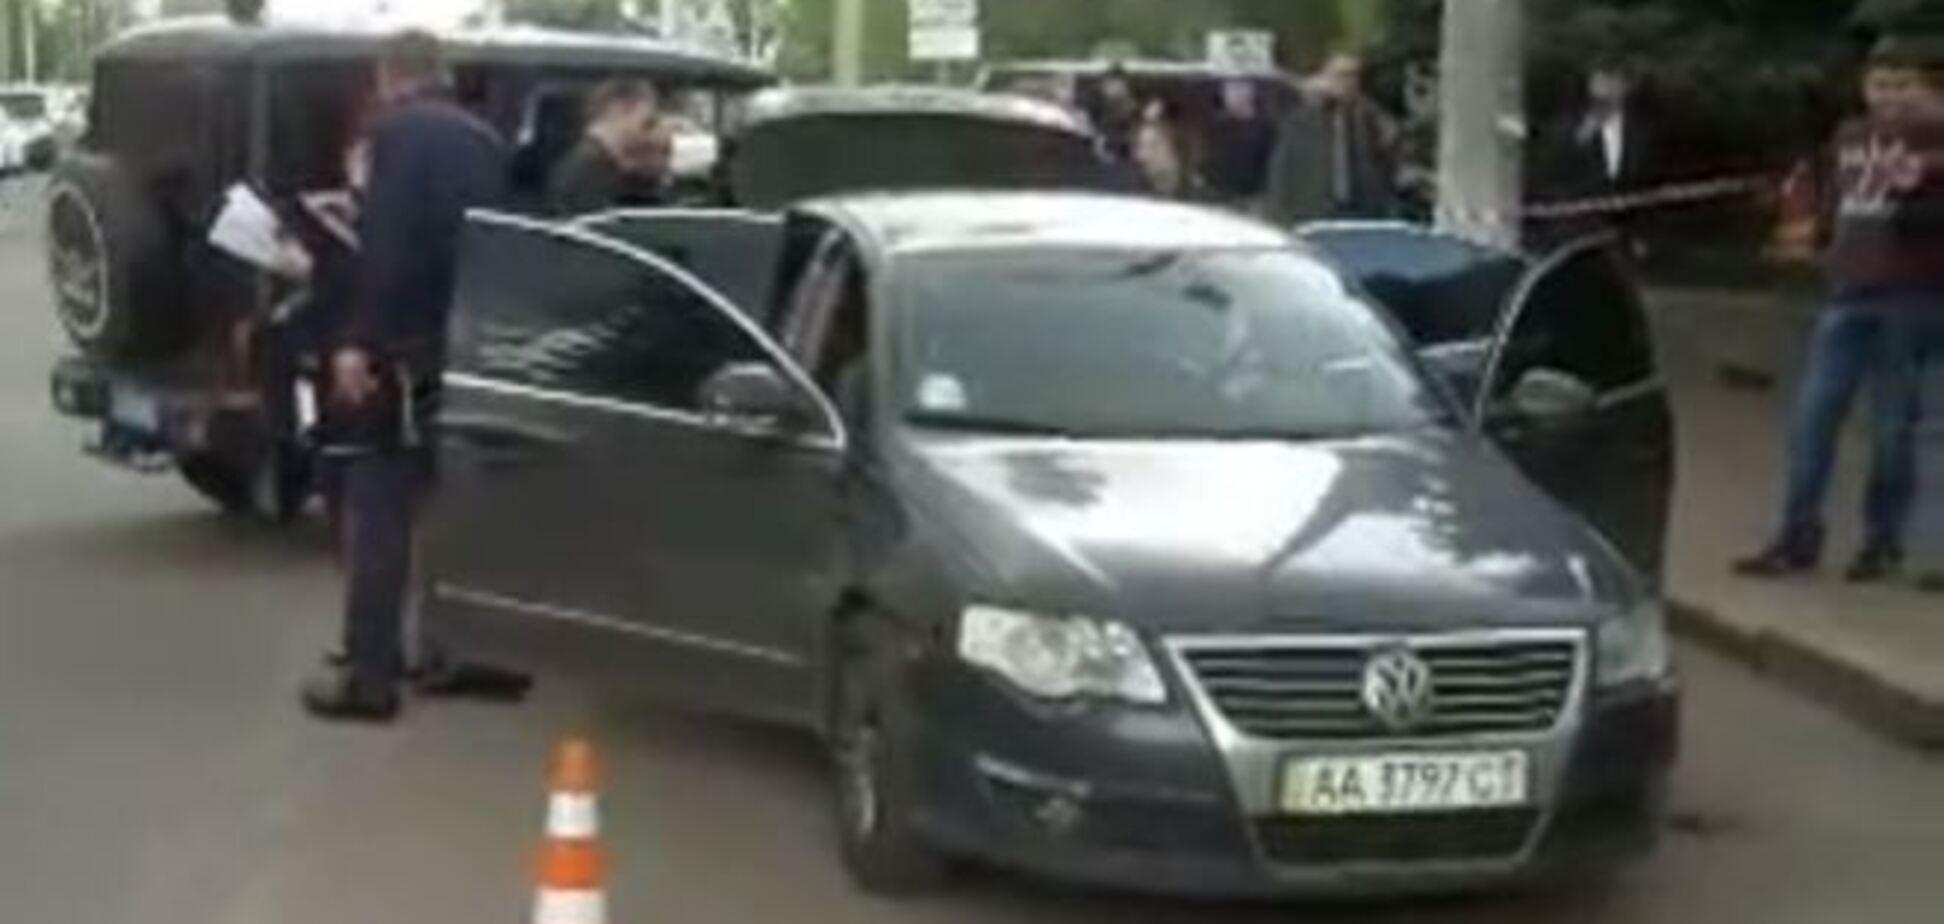 В центре Чернигова расстреляли двух мужчин